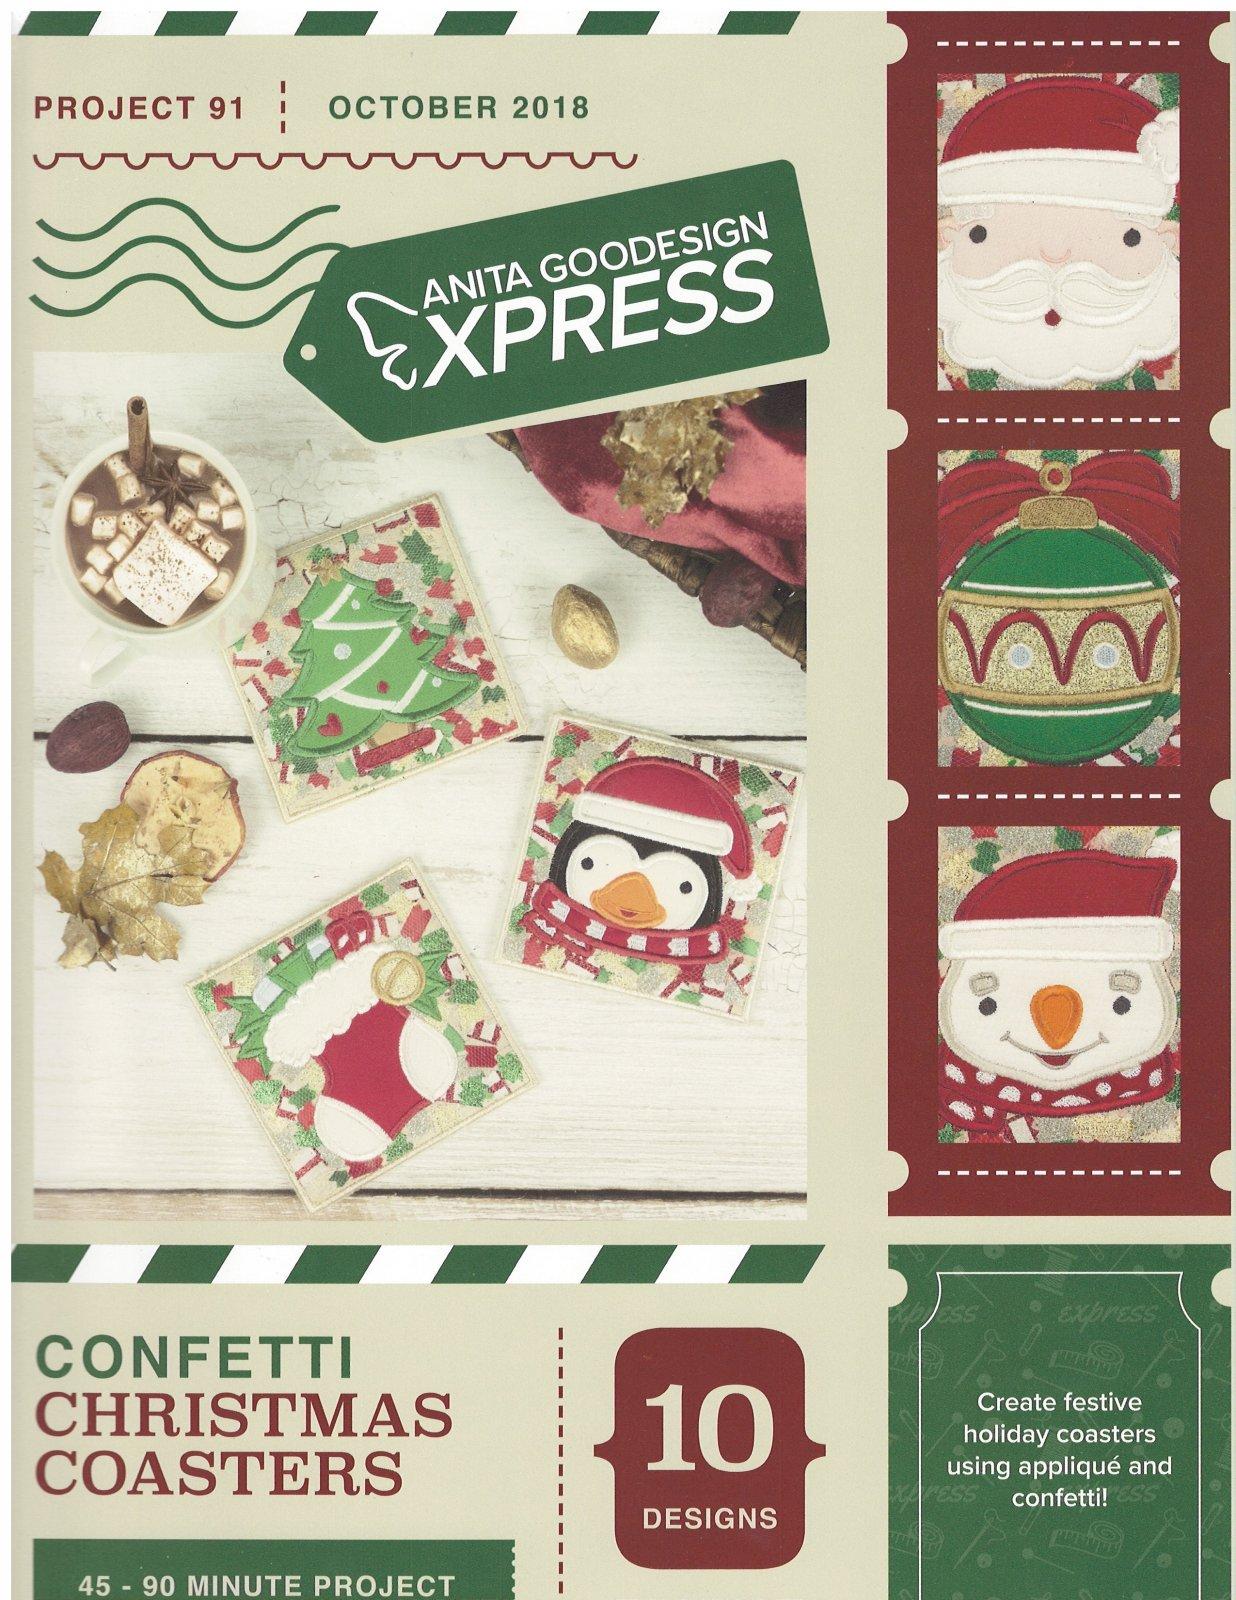 AG Express Name: Confetti Christmas Coasters